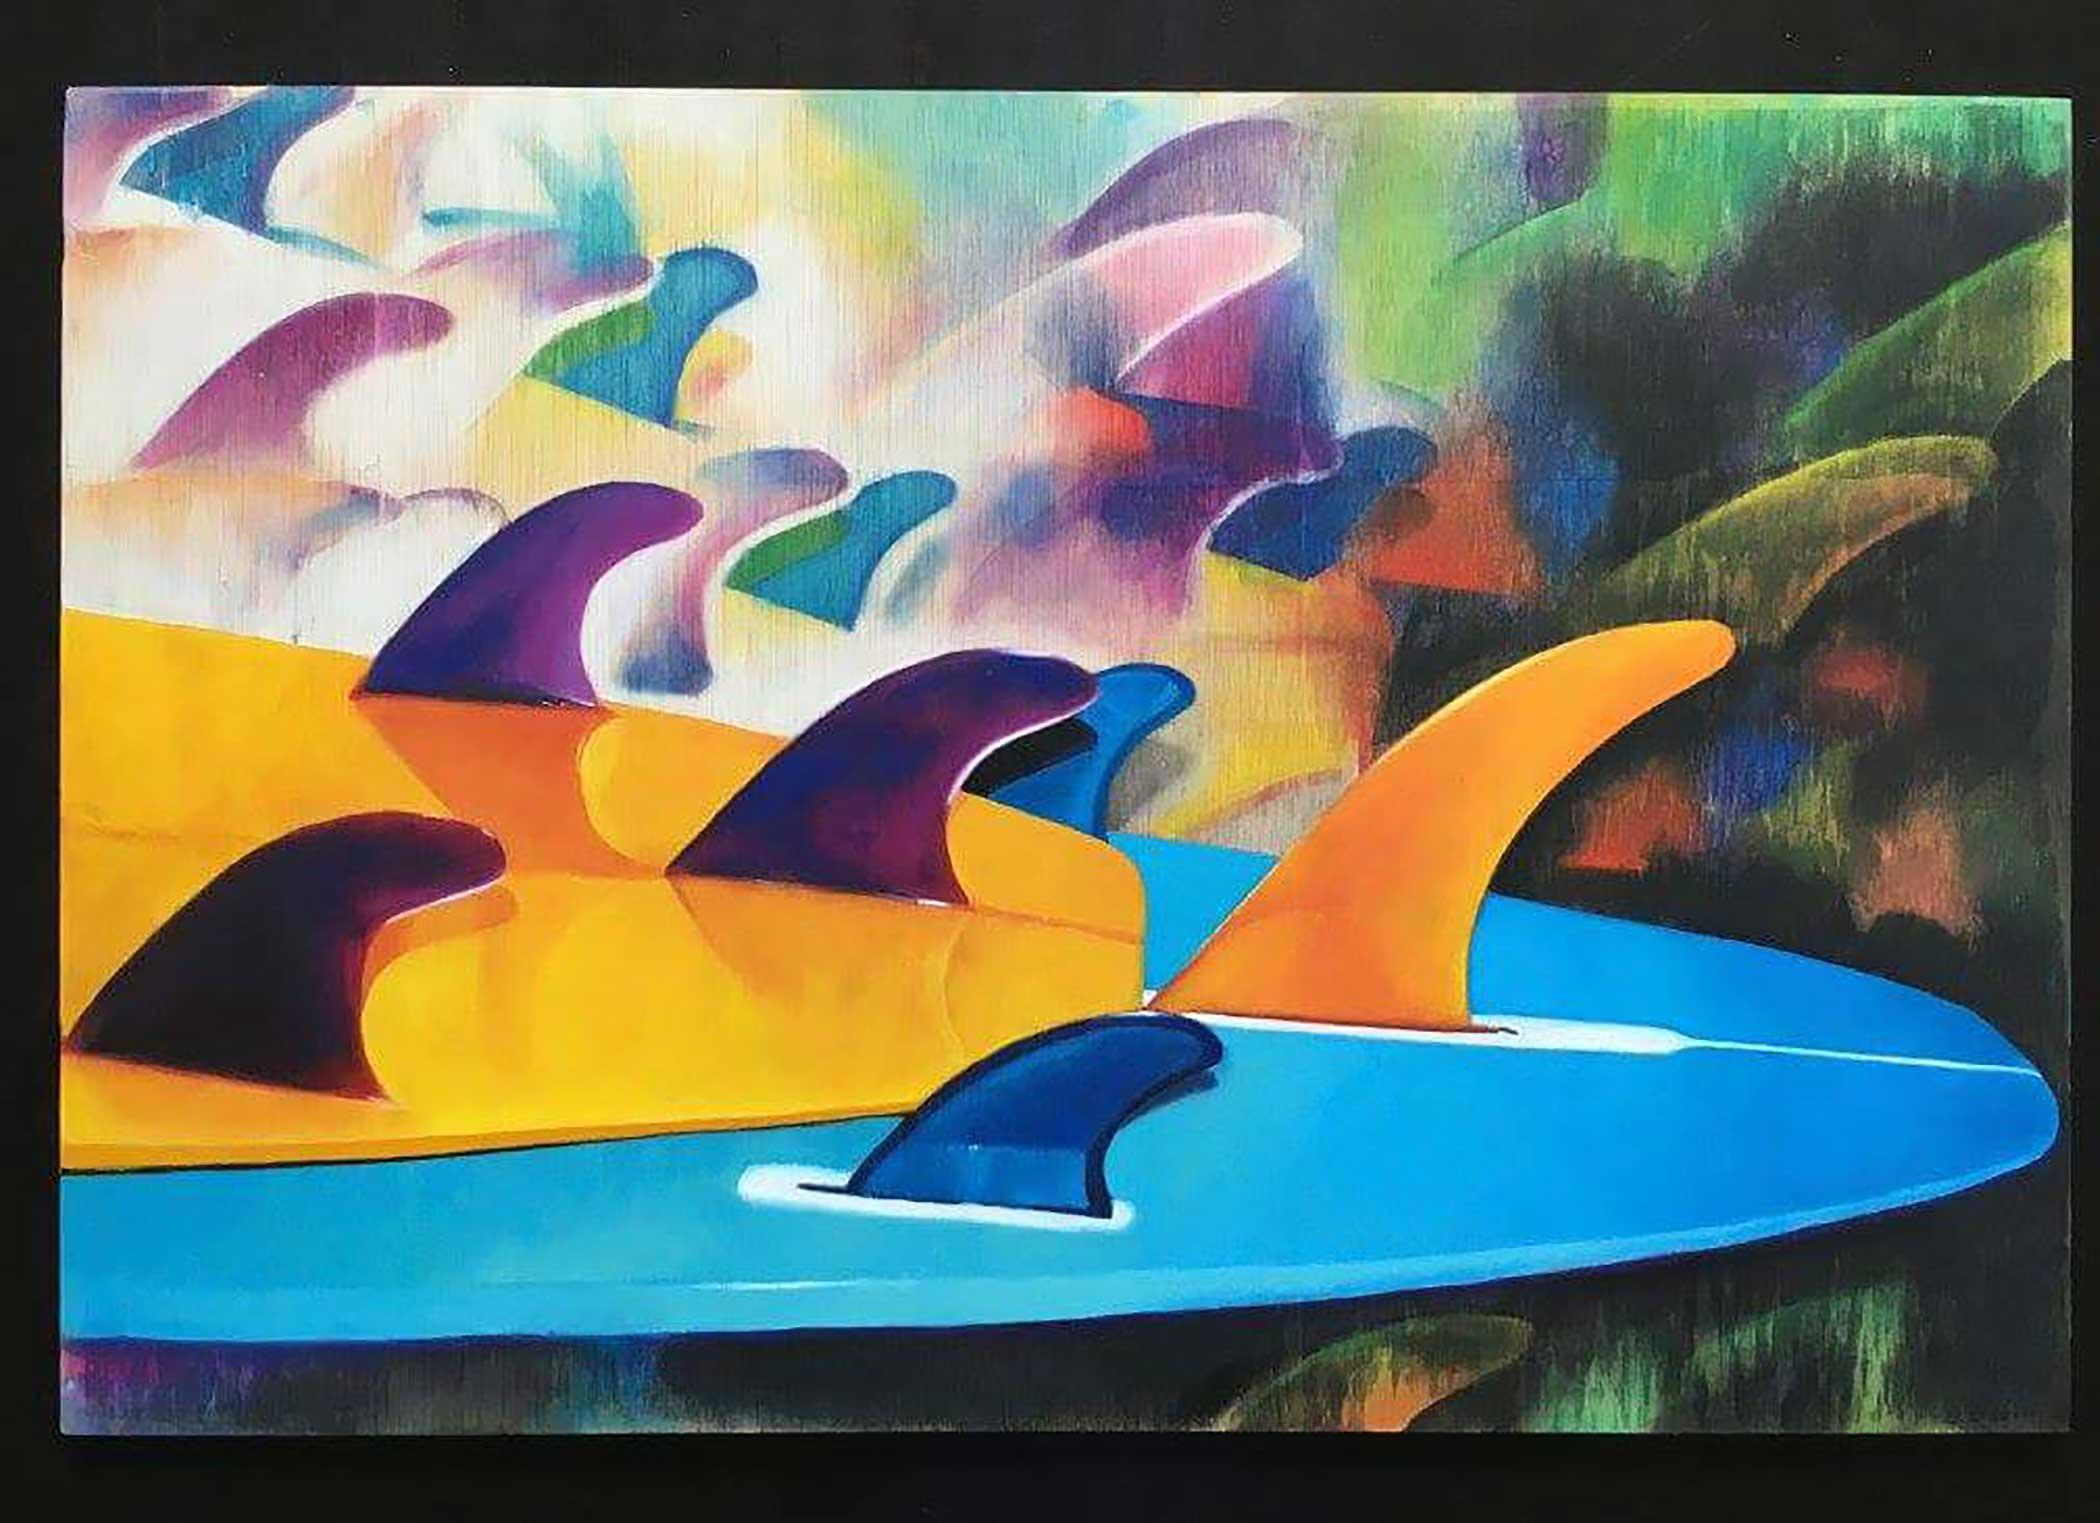 """Multicolors Fins"" Mixed Media/ Oil on Wood 60cm x 40cm 2016"